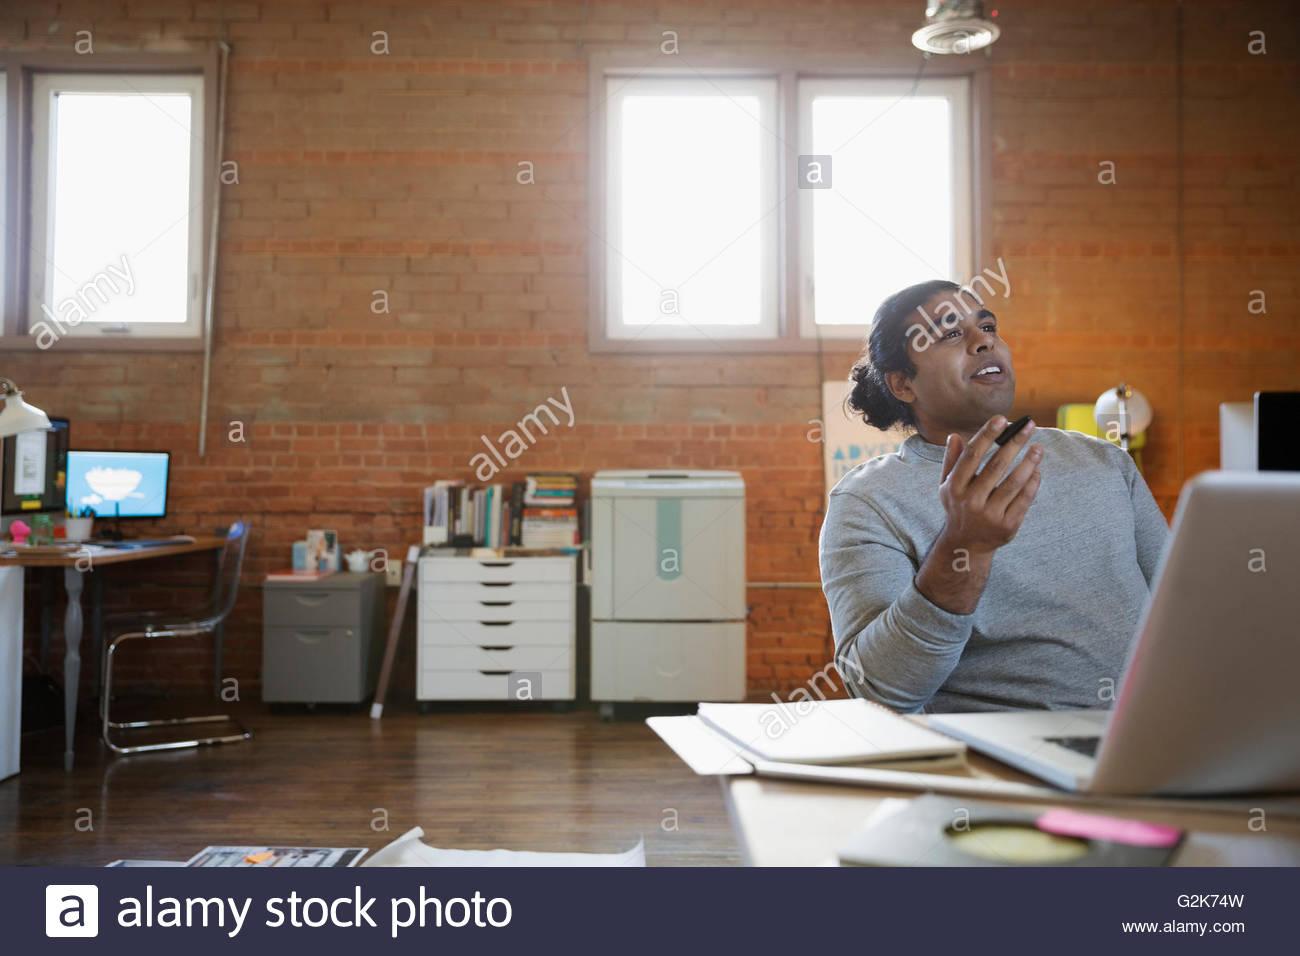 Designer talking at laptop in office - Stock Image